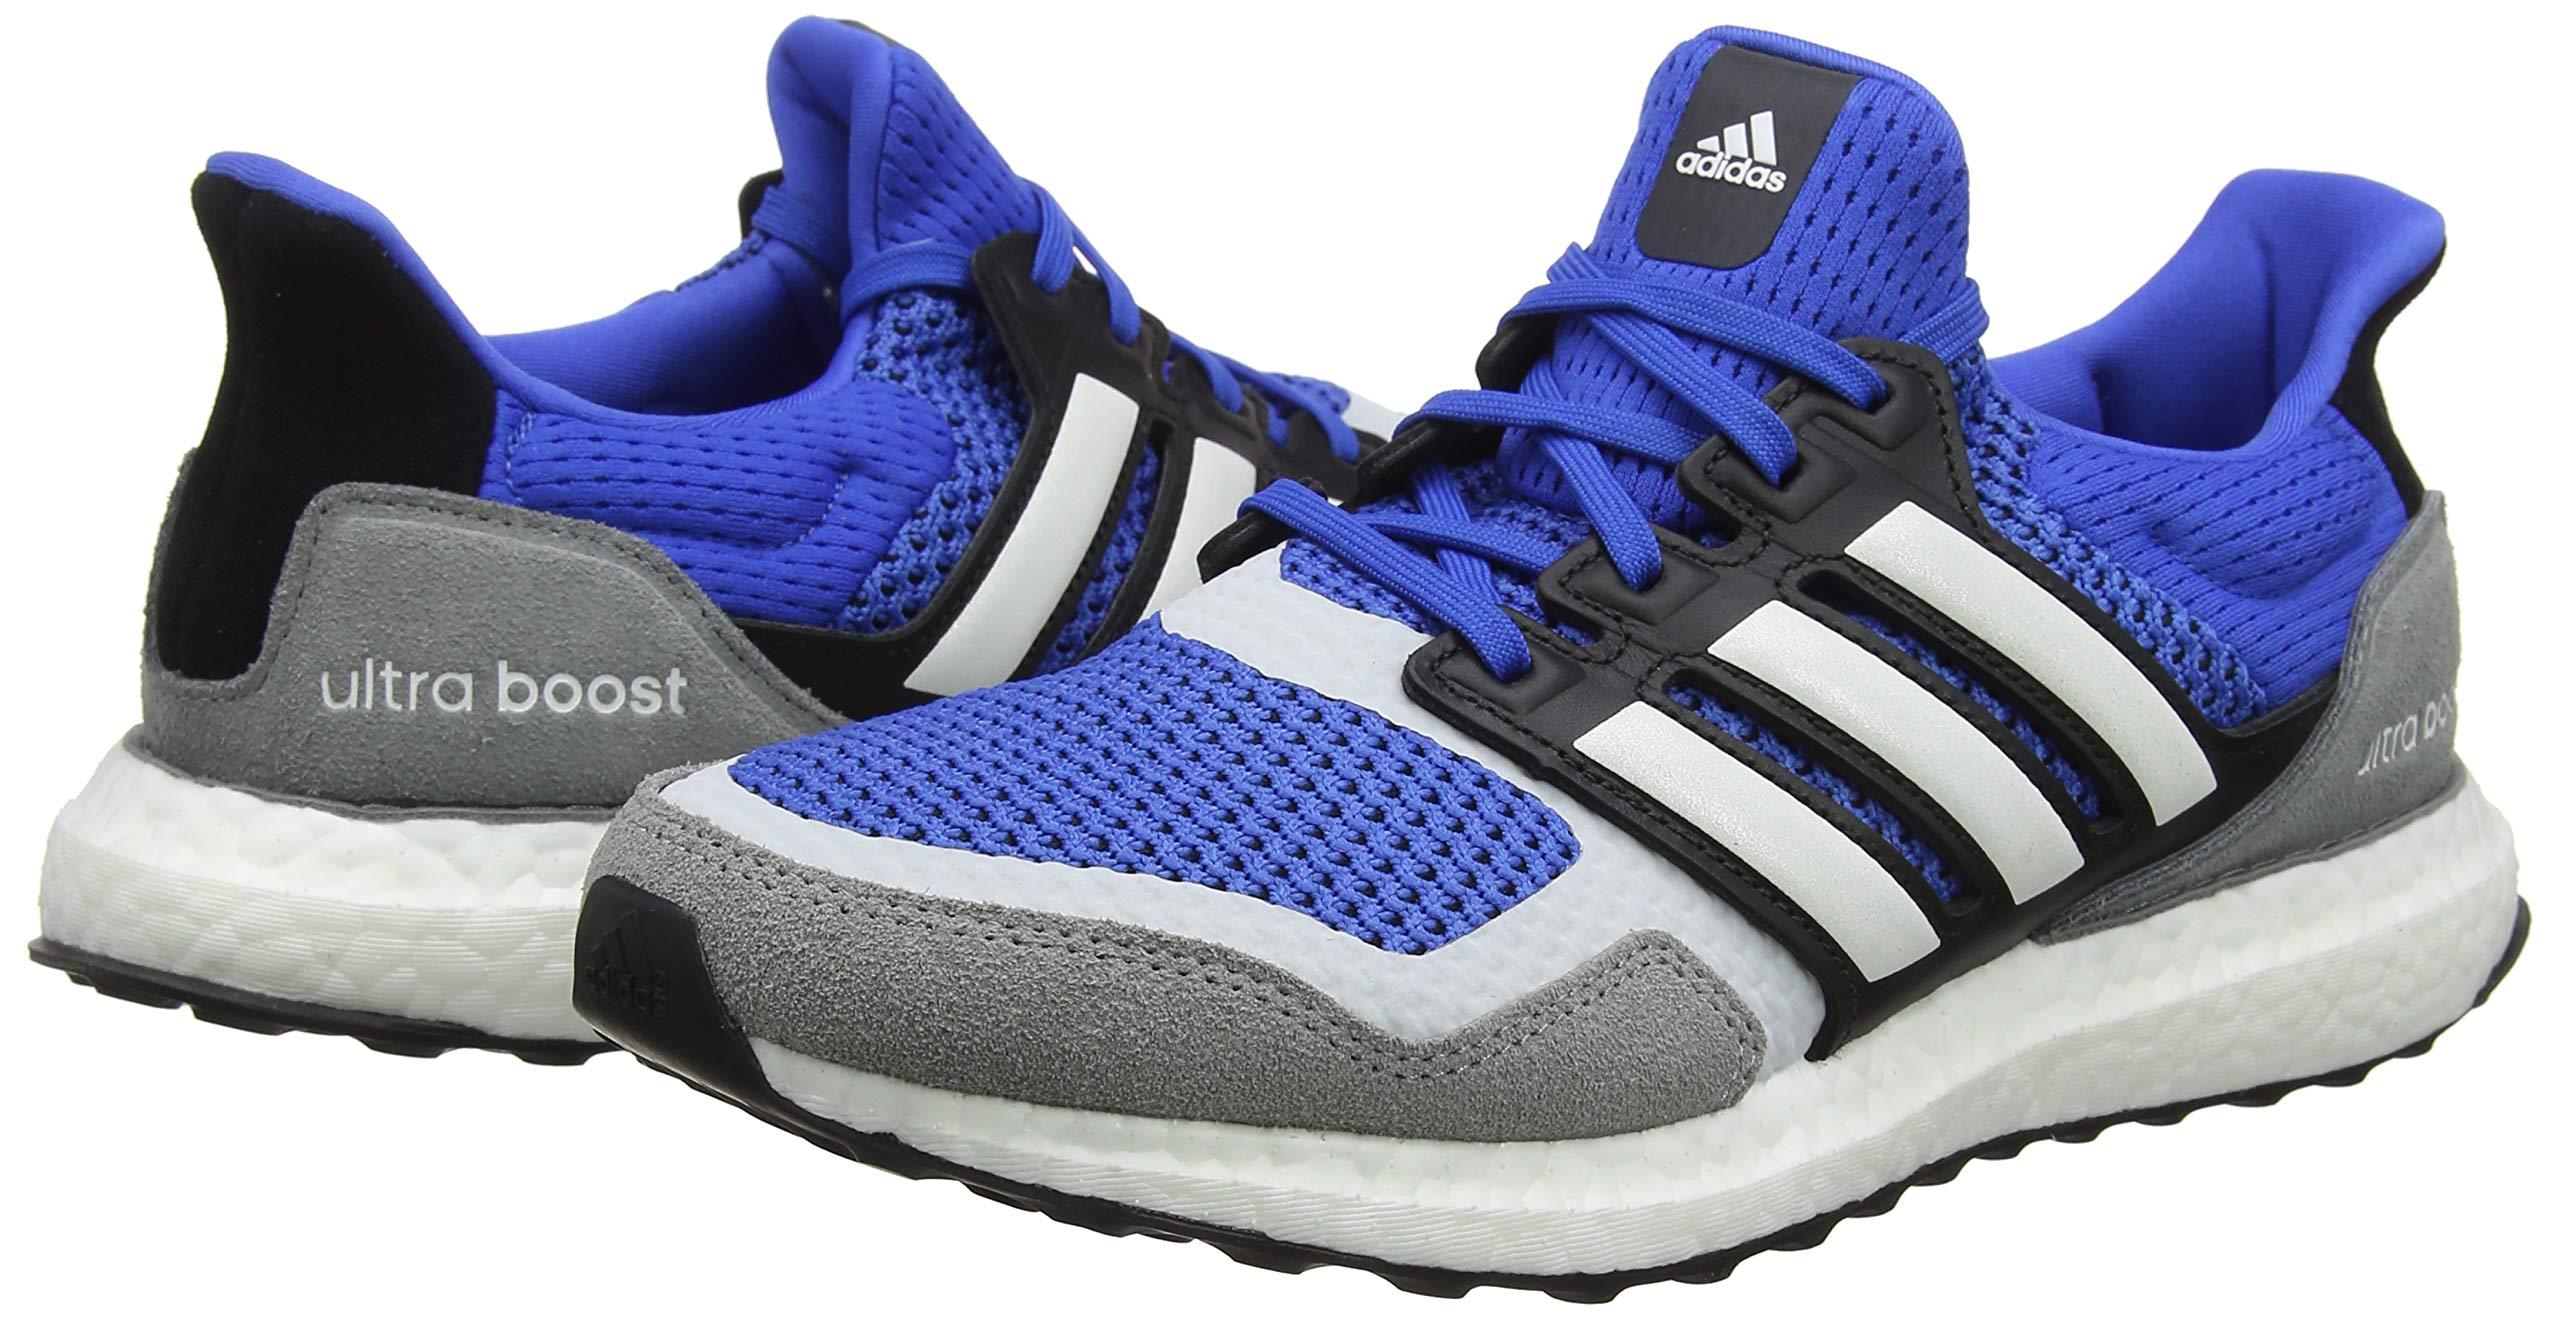 adidas Ultraboost S&l, Scarpe da Running Uomo 5 spesavip